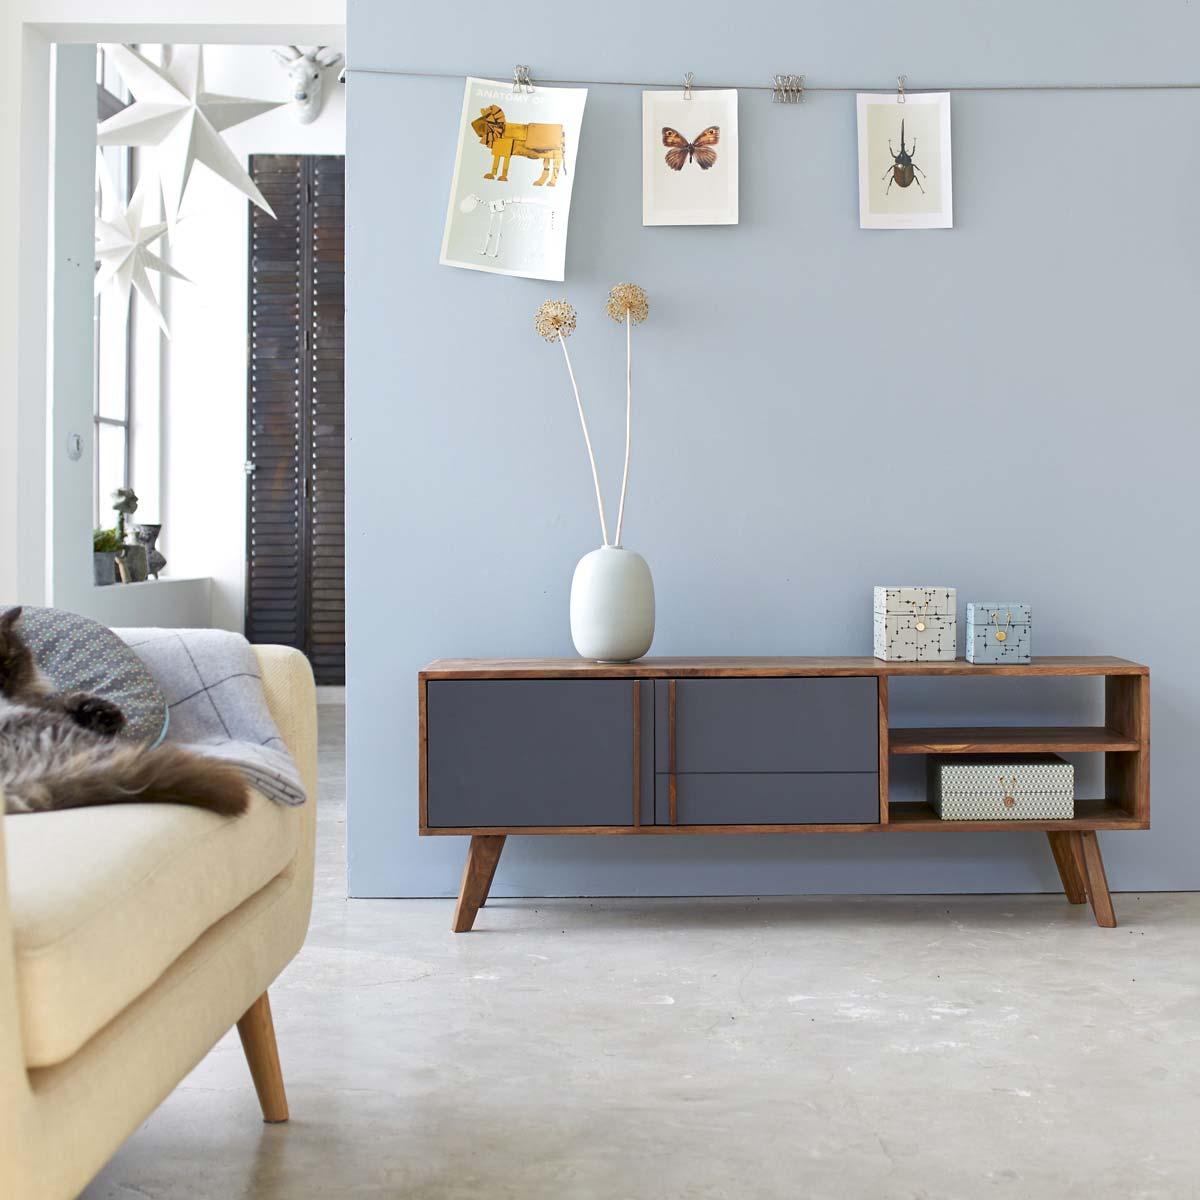 Meuble tv scandinave en bois fonc - Idee deco salon scandinave ...